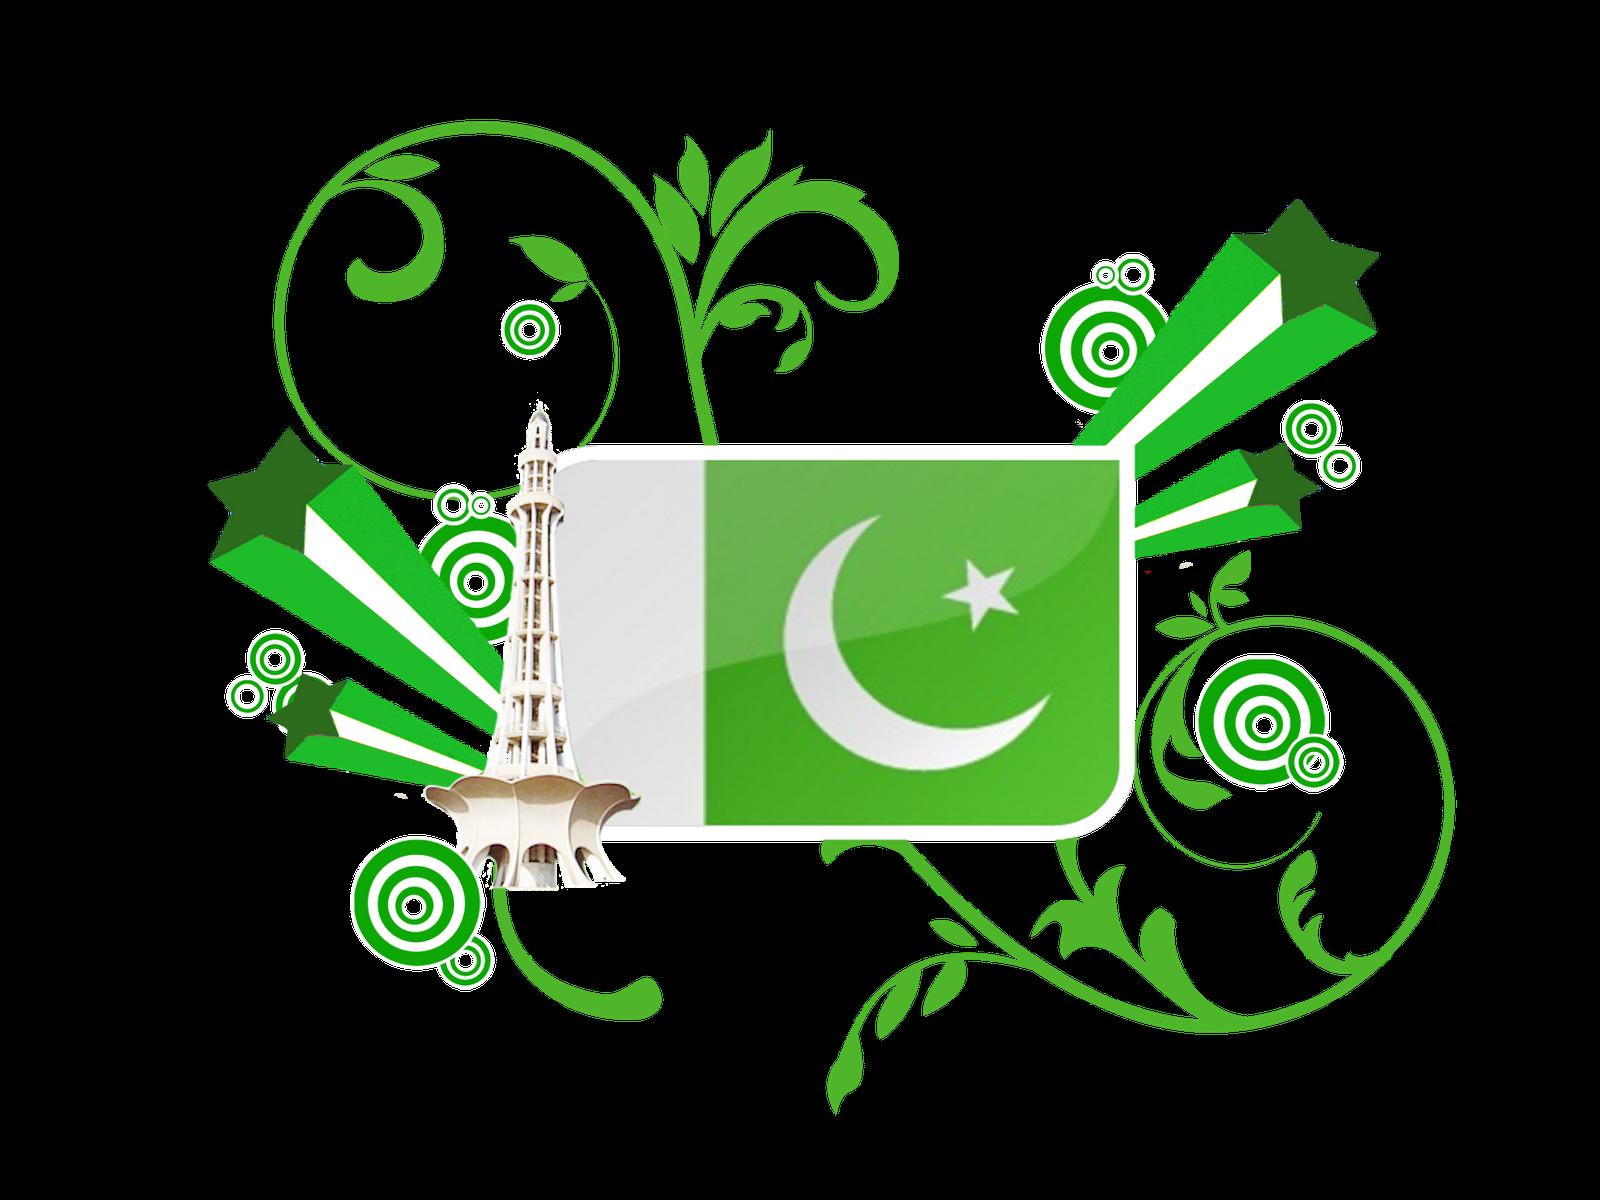 pakistan zindabad Watch pakistan zindabad by uzma entertainment unlimited on dailymotion here.